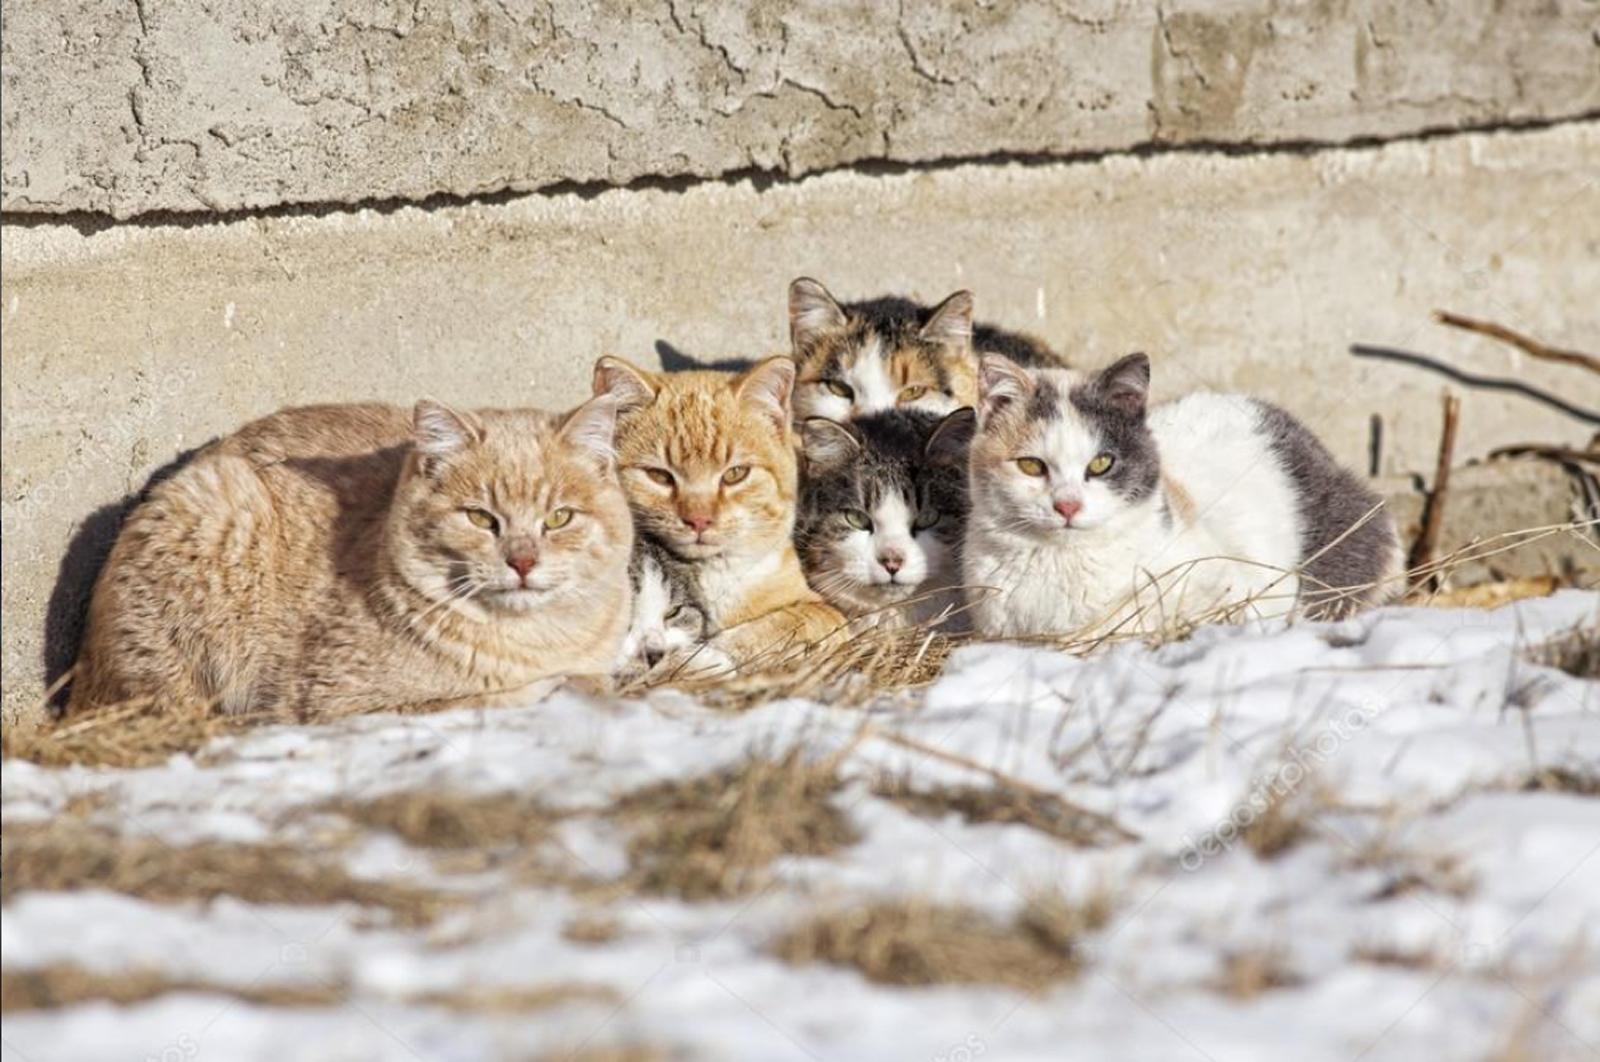 OSPCA seasonal programs assist feral cats